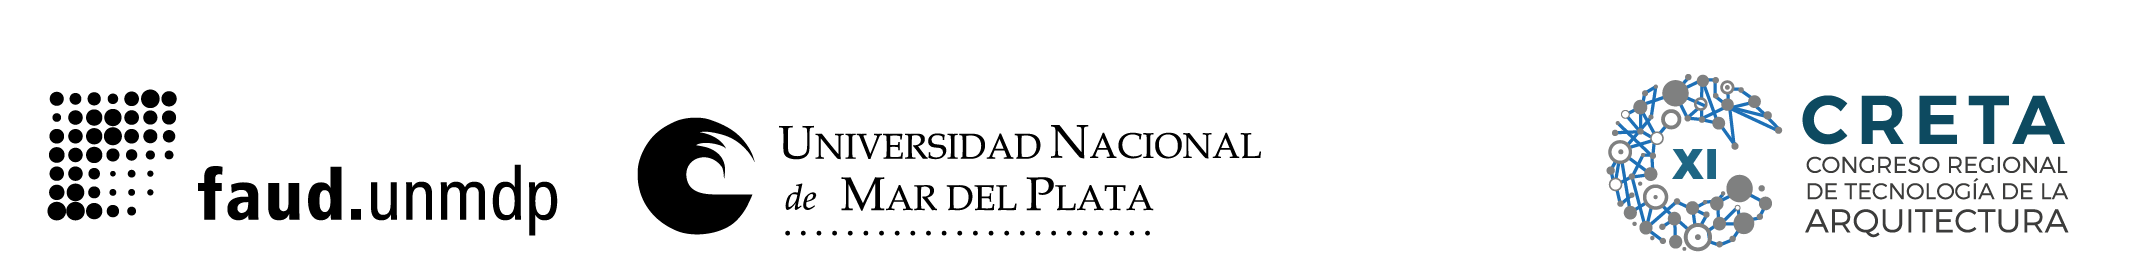 Congreso CRETA XI